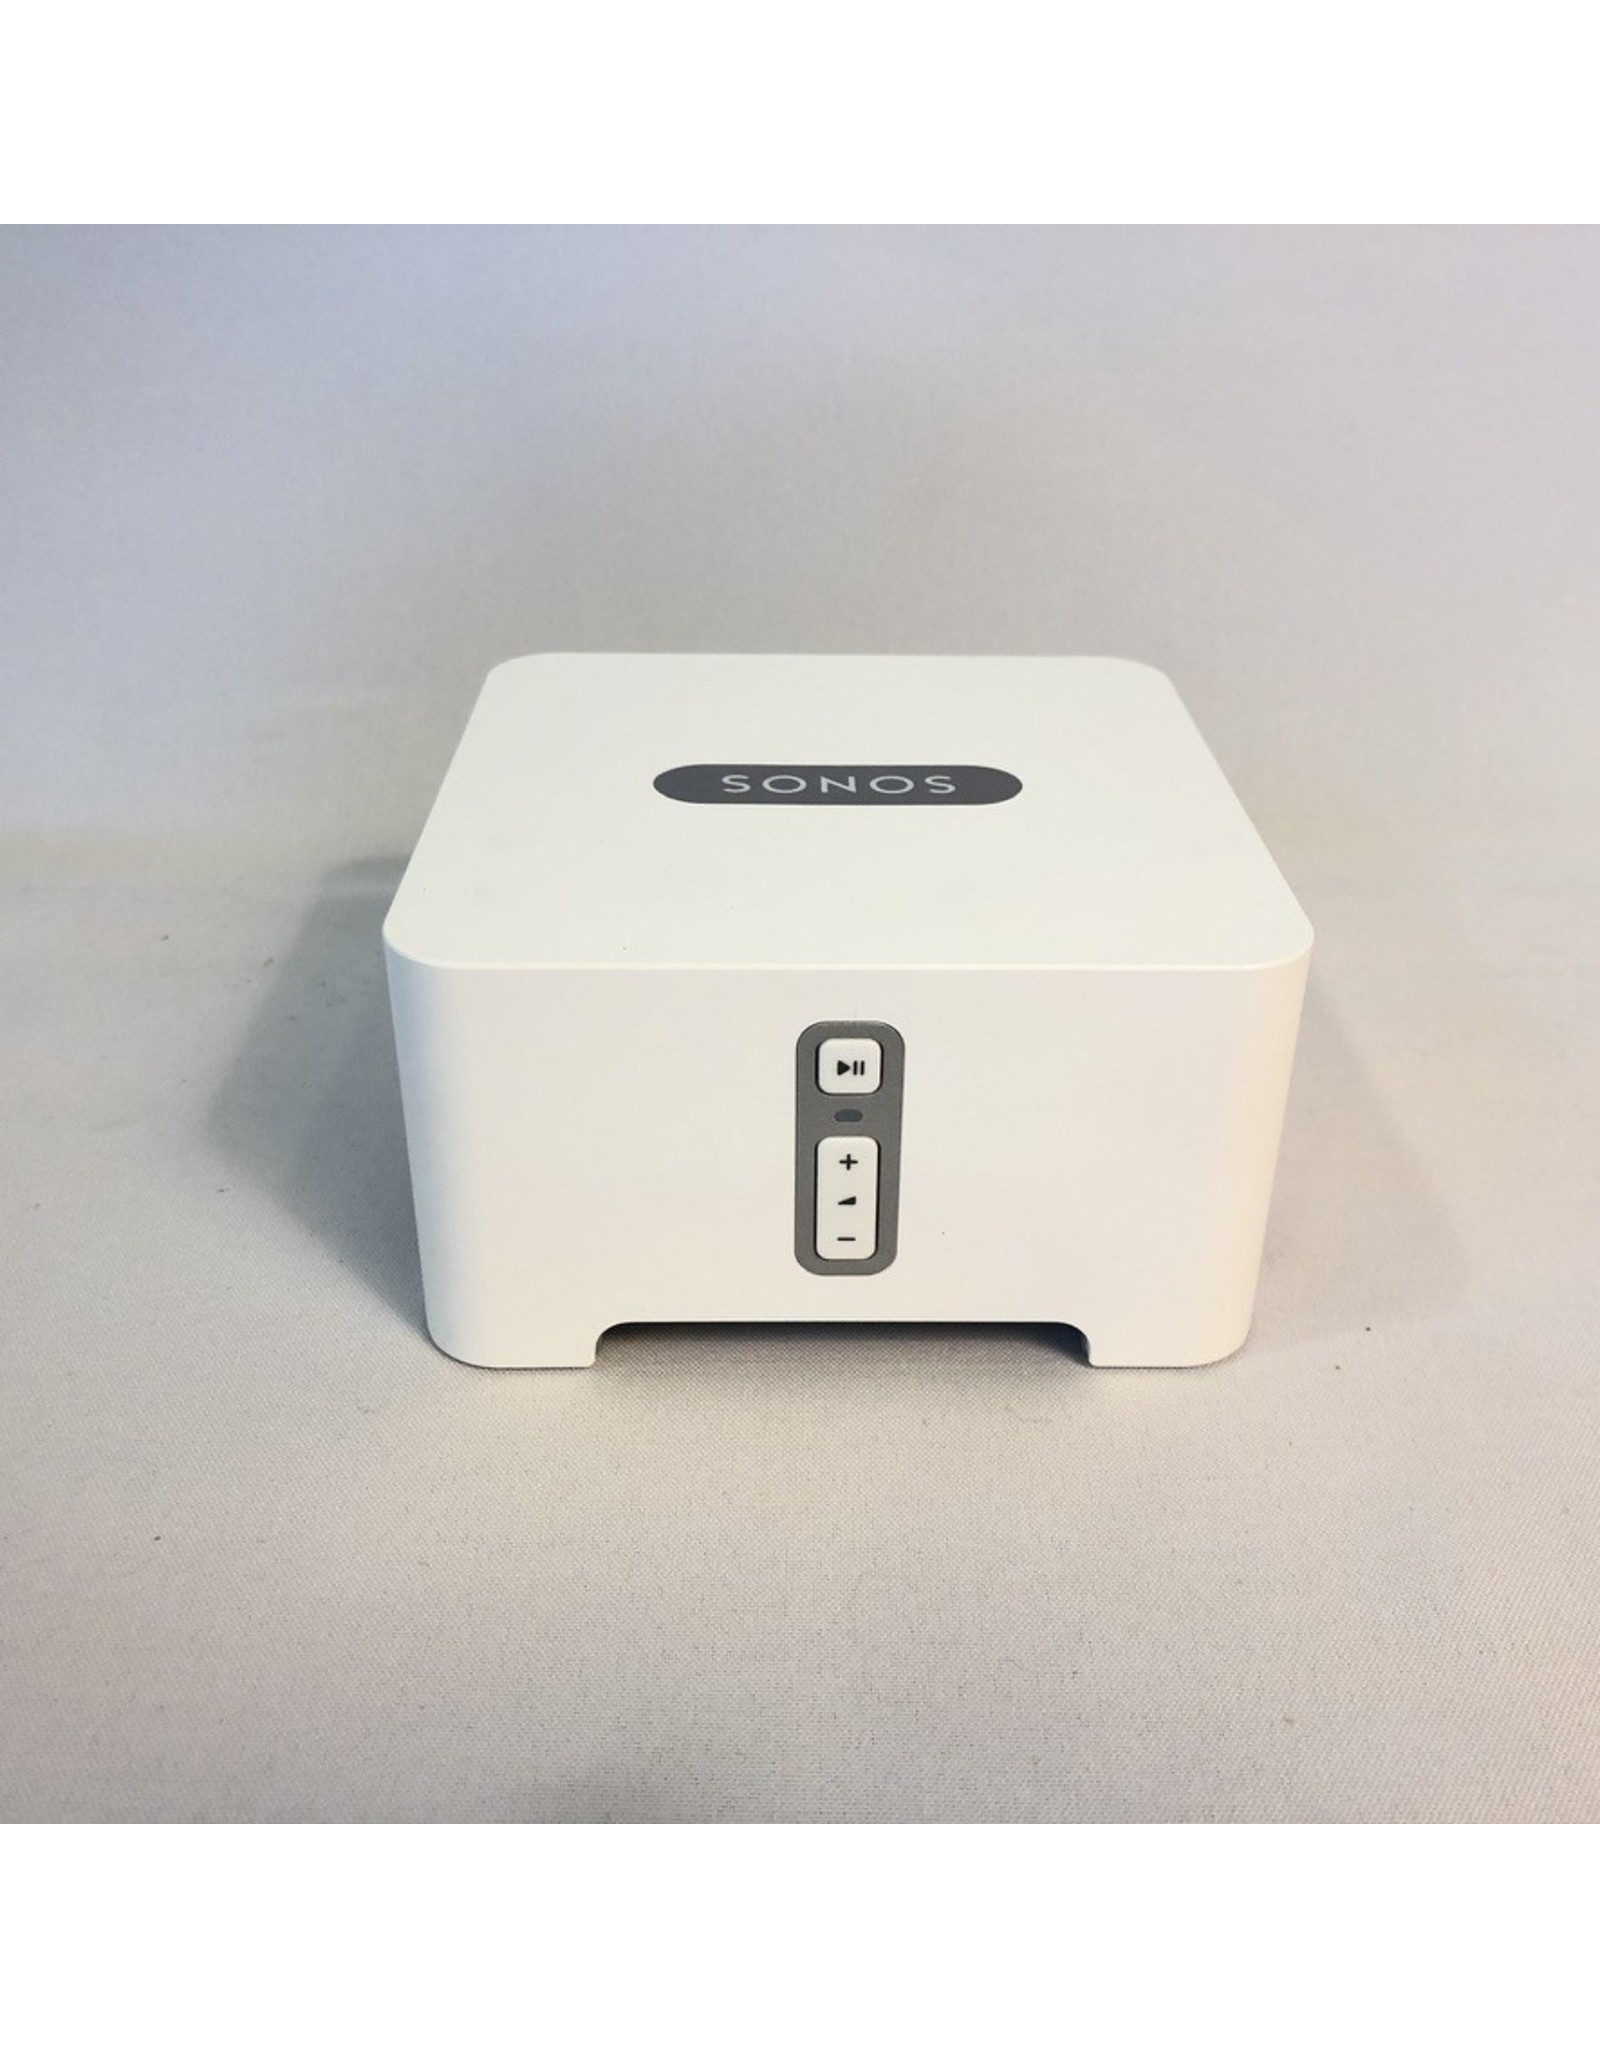 Sonos Sonos Connect gen2 Network Player USED